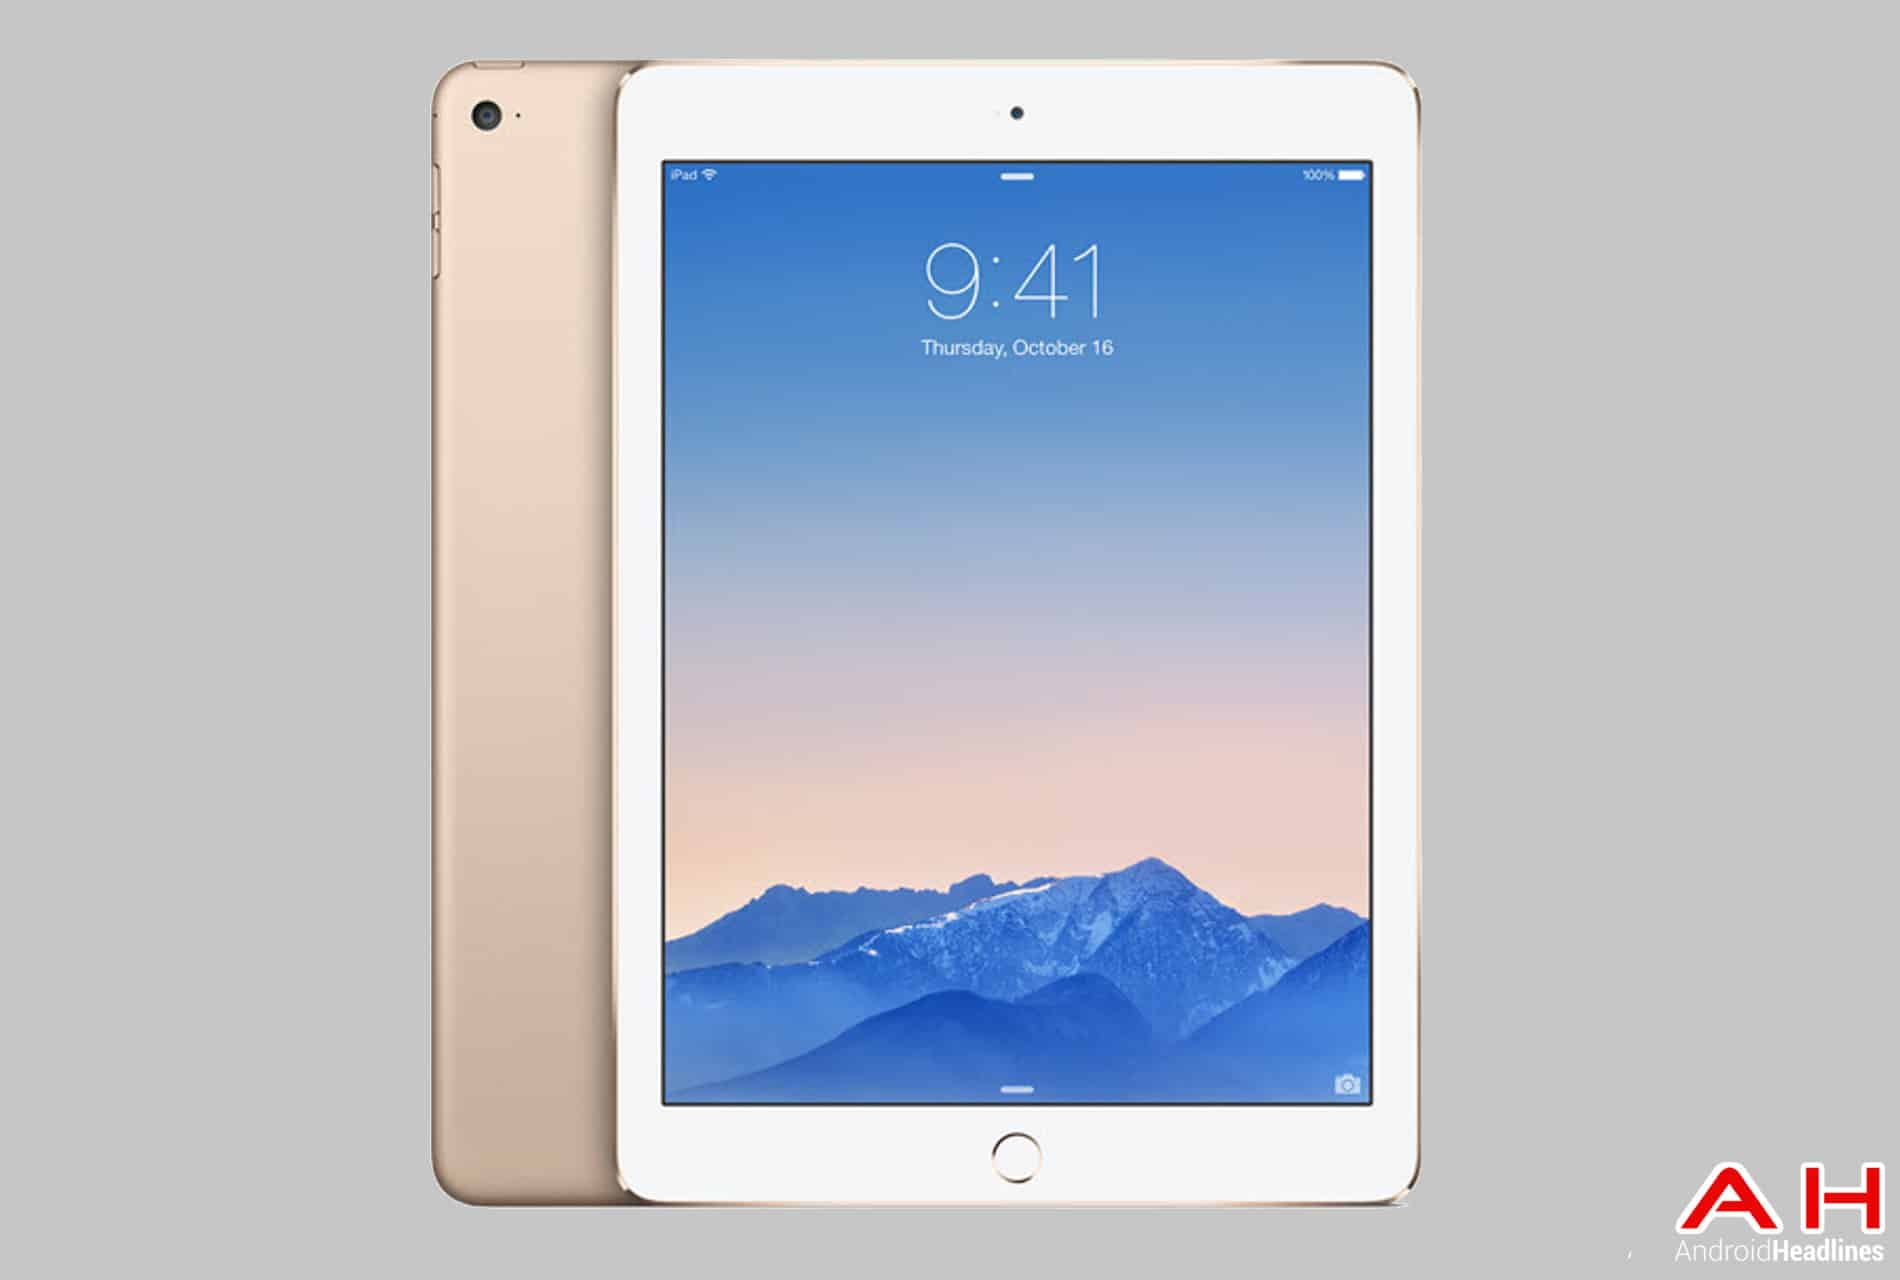 Tablet Comparison: Google Nexus 9 vs Apple iPad Air 2